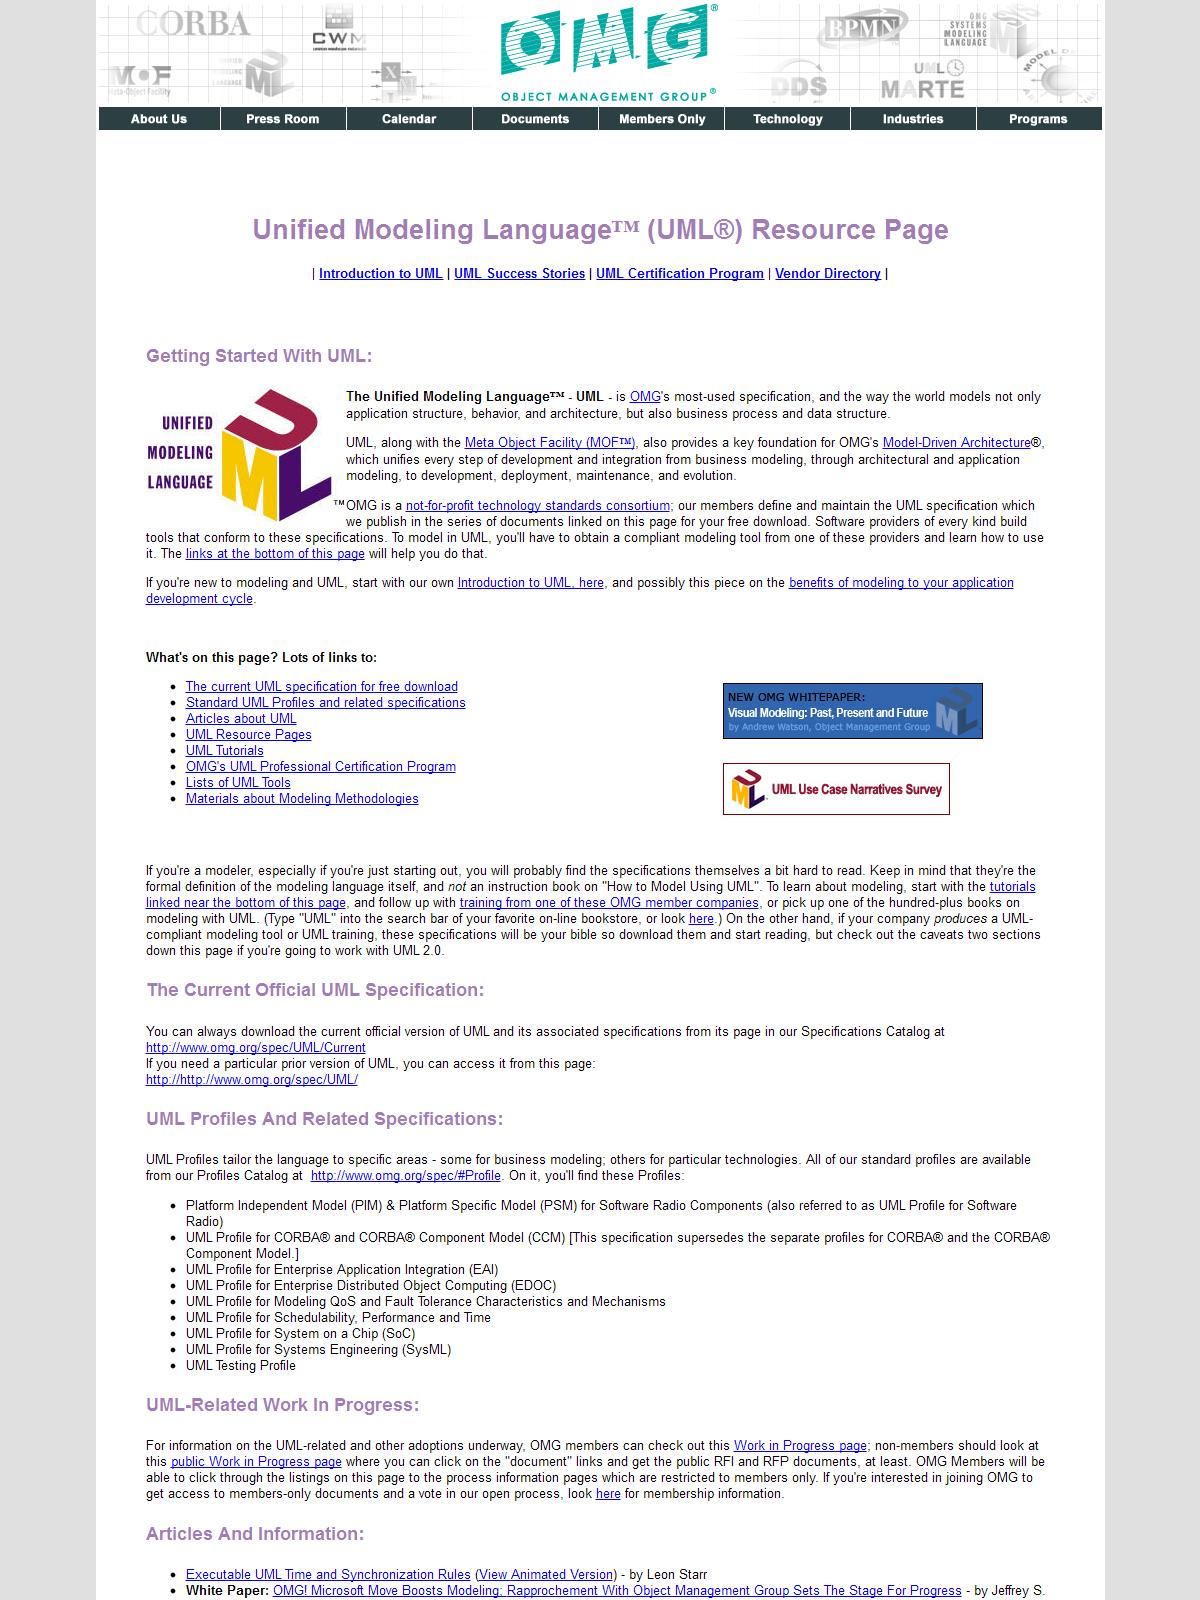 Unified Modeling Language (UML) - BPI - The destination ...